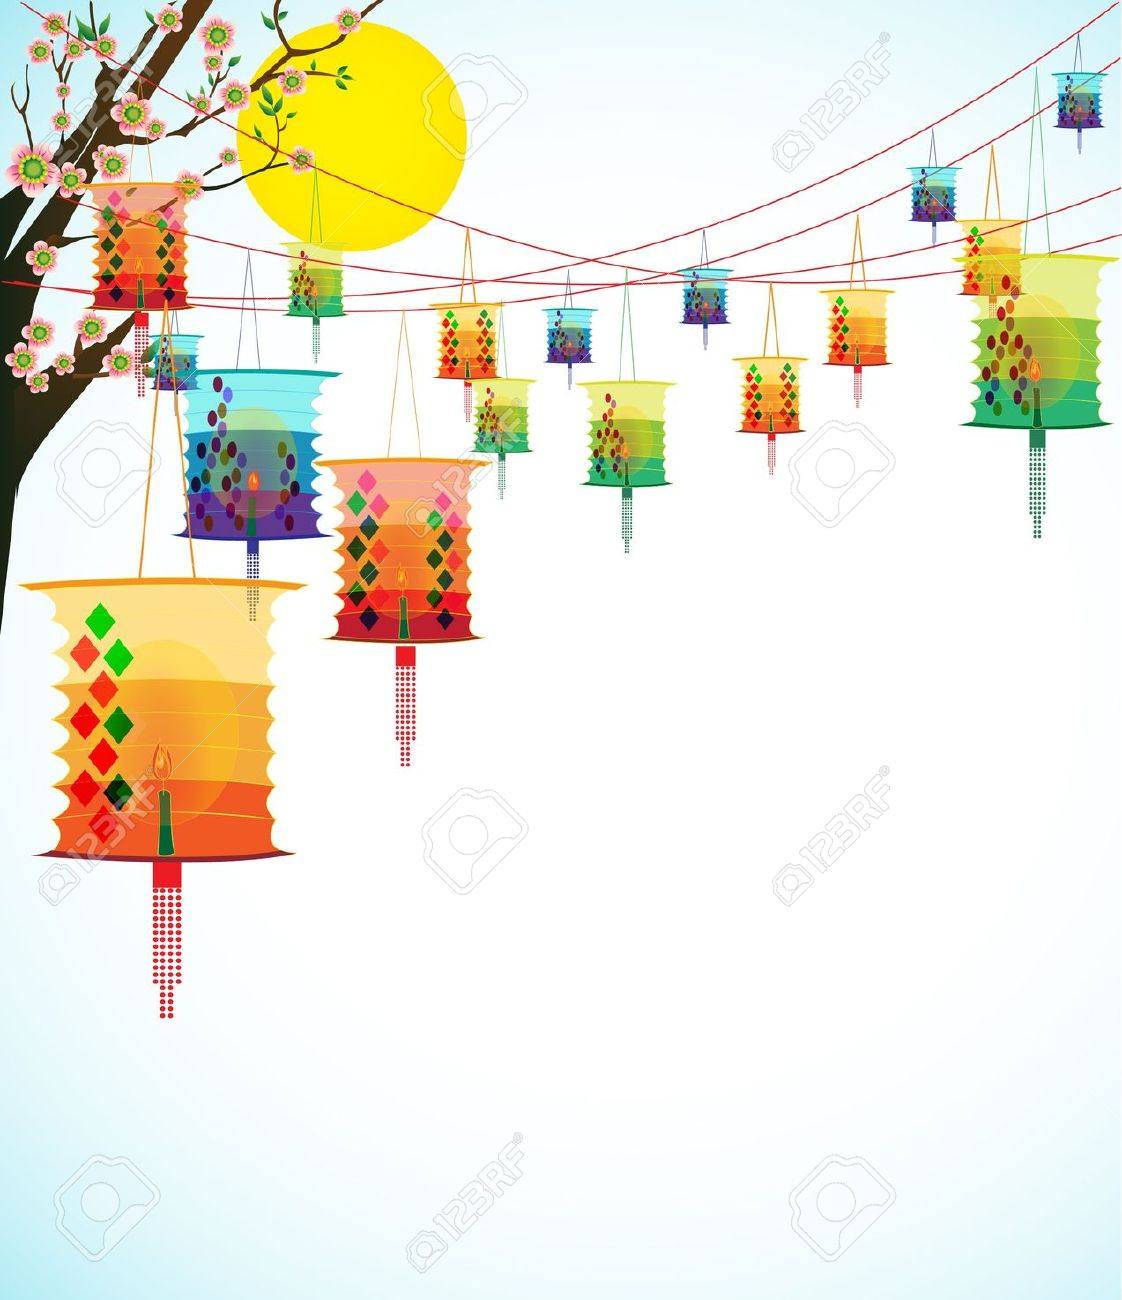 Lantern Festival Clipart